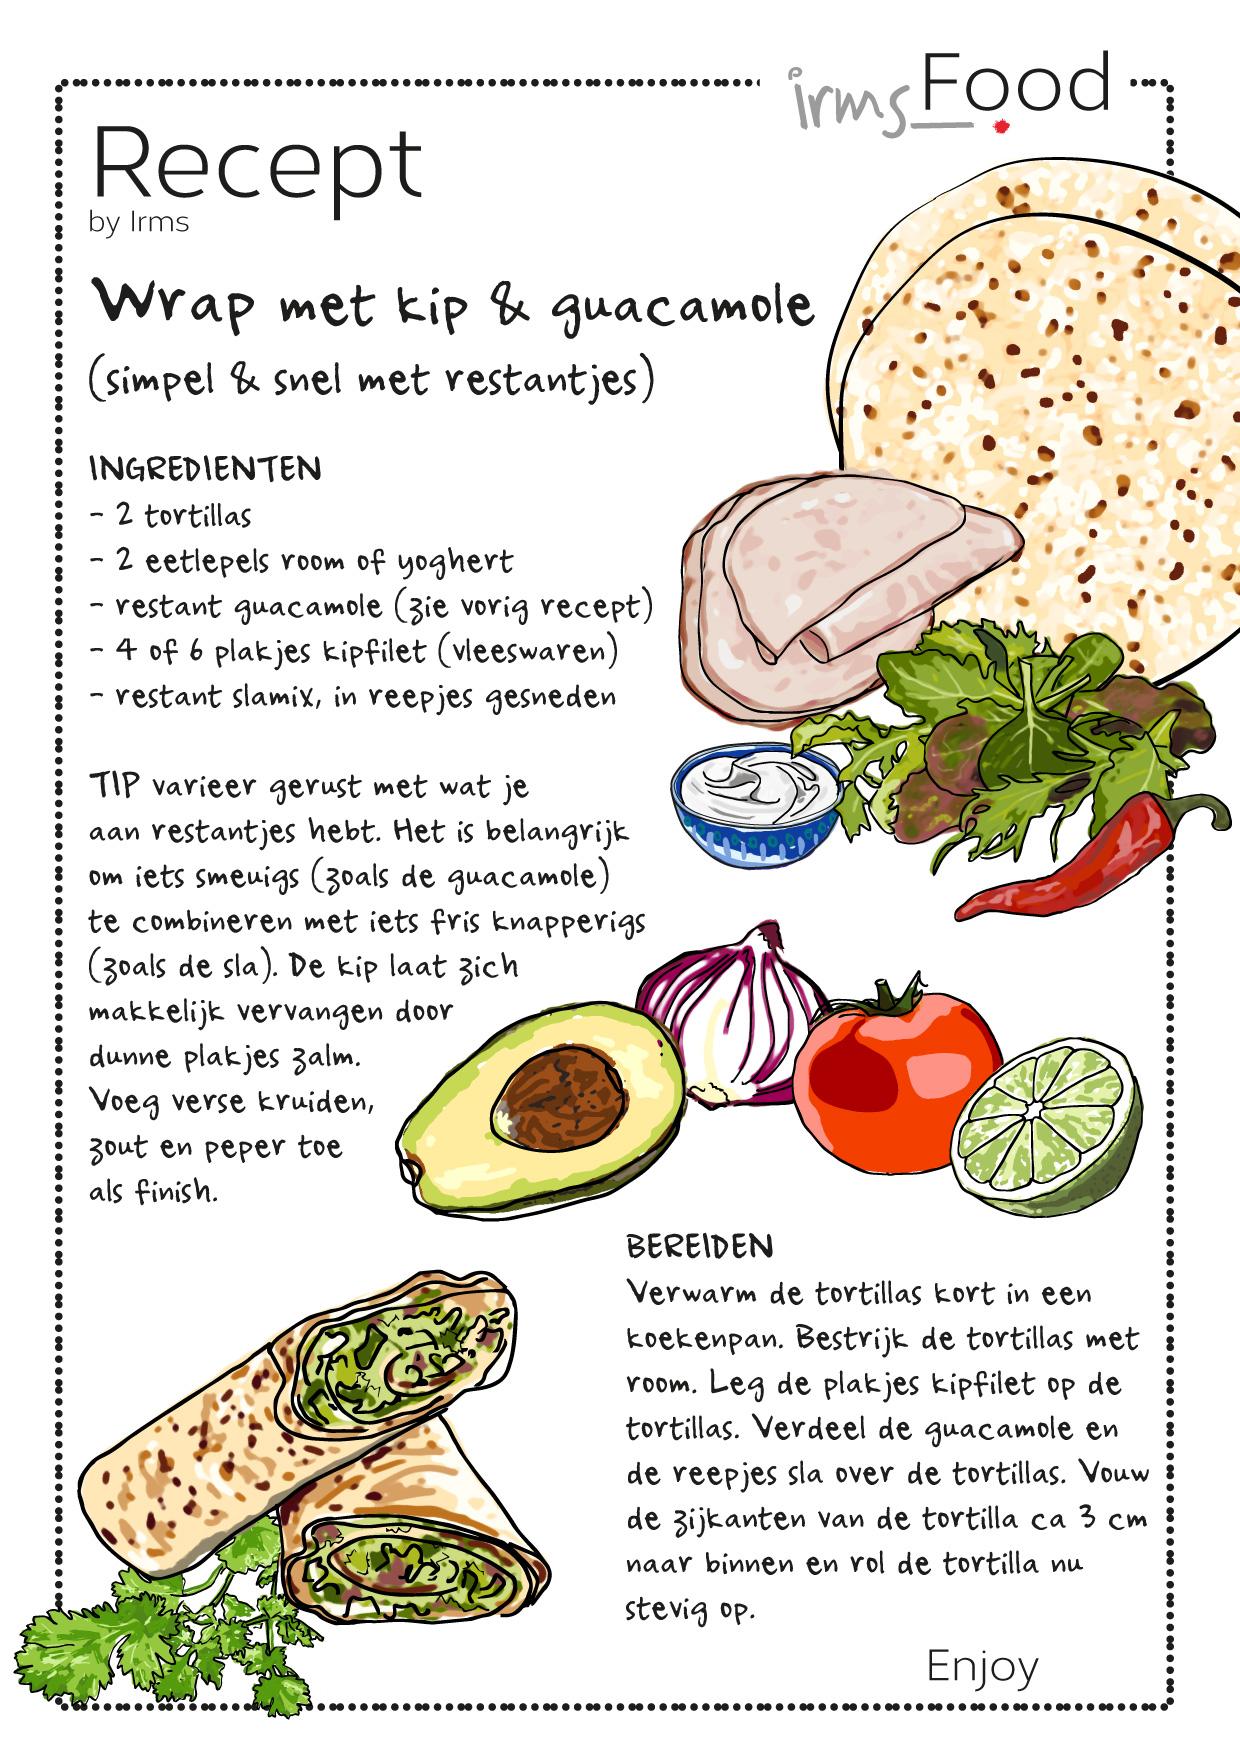 wrap-kip-guacamole-irmsblog-recept